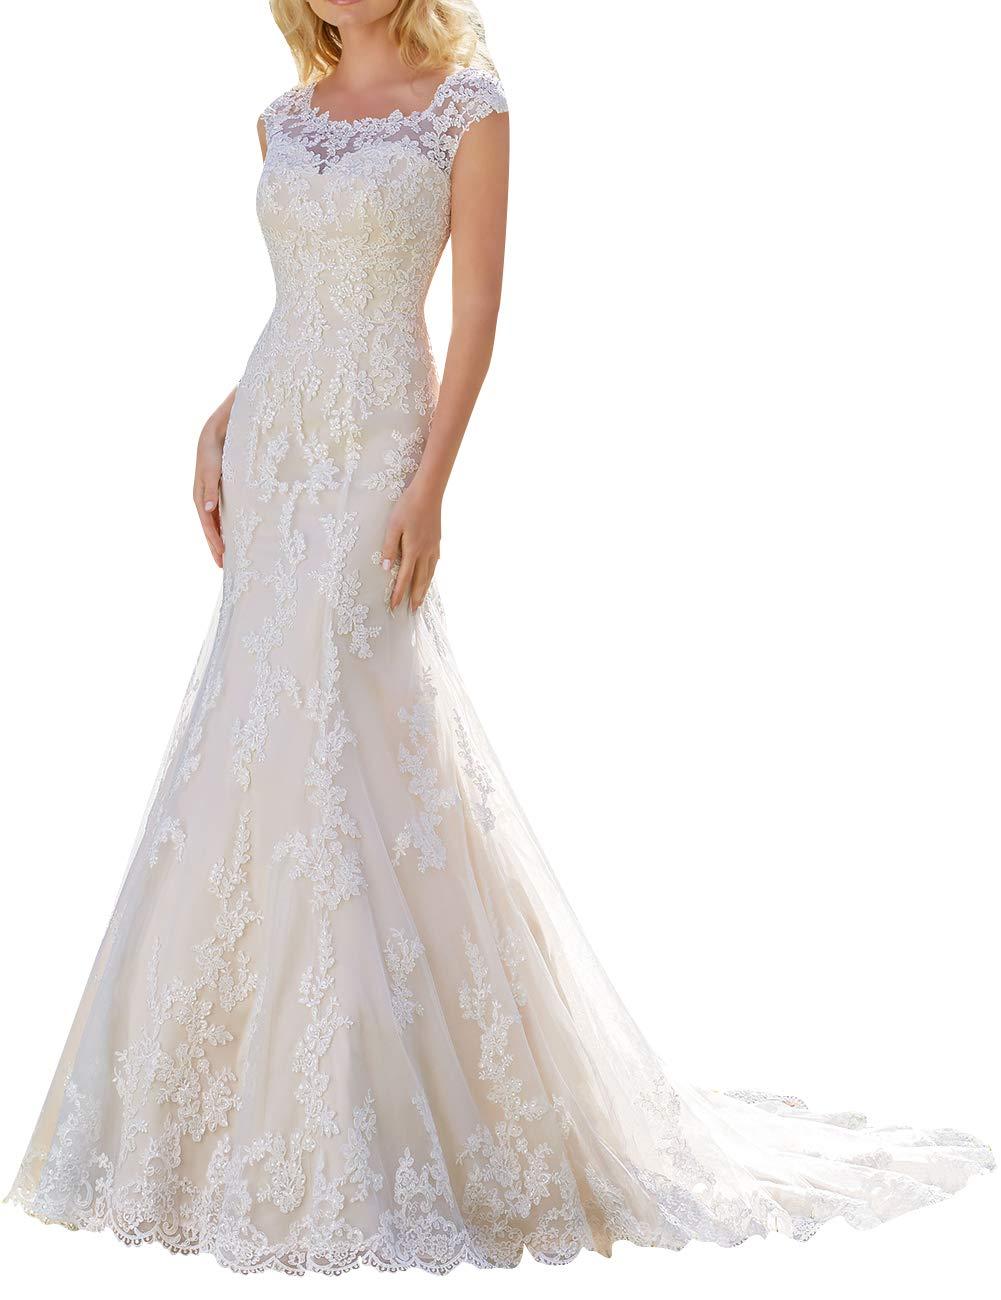 6a0d0d1cad3 JAEDEN Wedding Dress for Bride Lace Bridal Dress Mermaid Bride ...